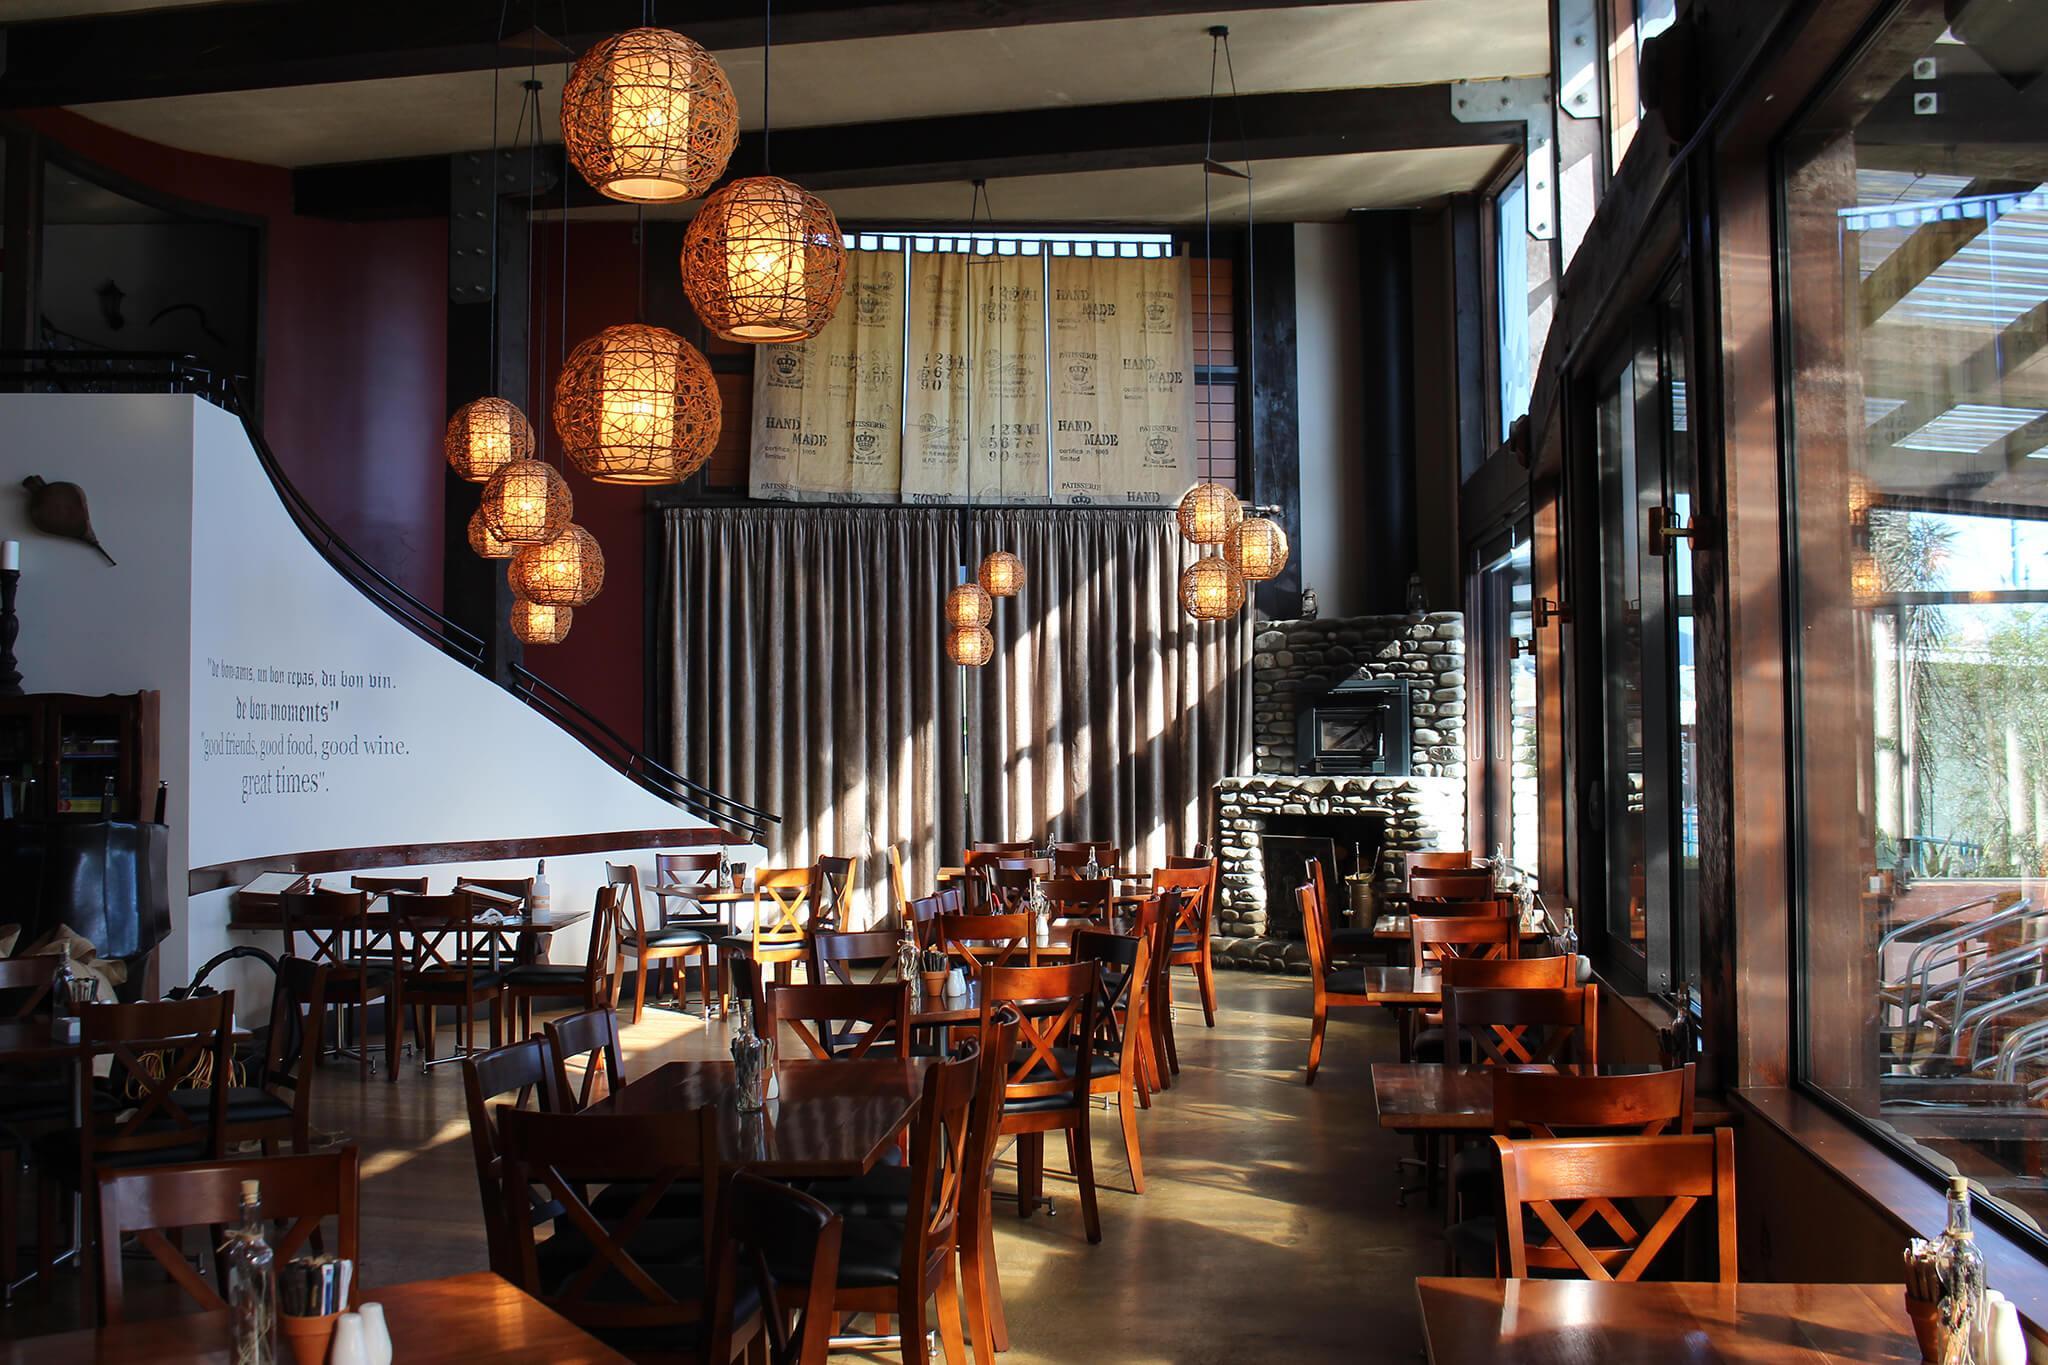 Saveur Cafe, Bistro & Patisserie